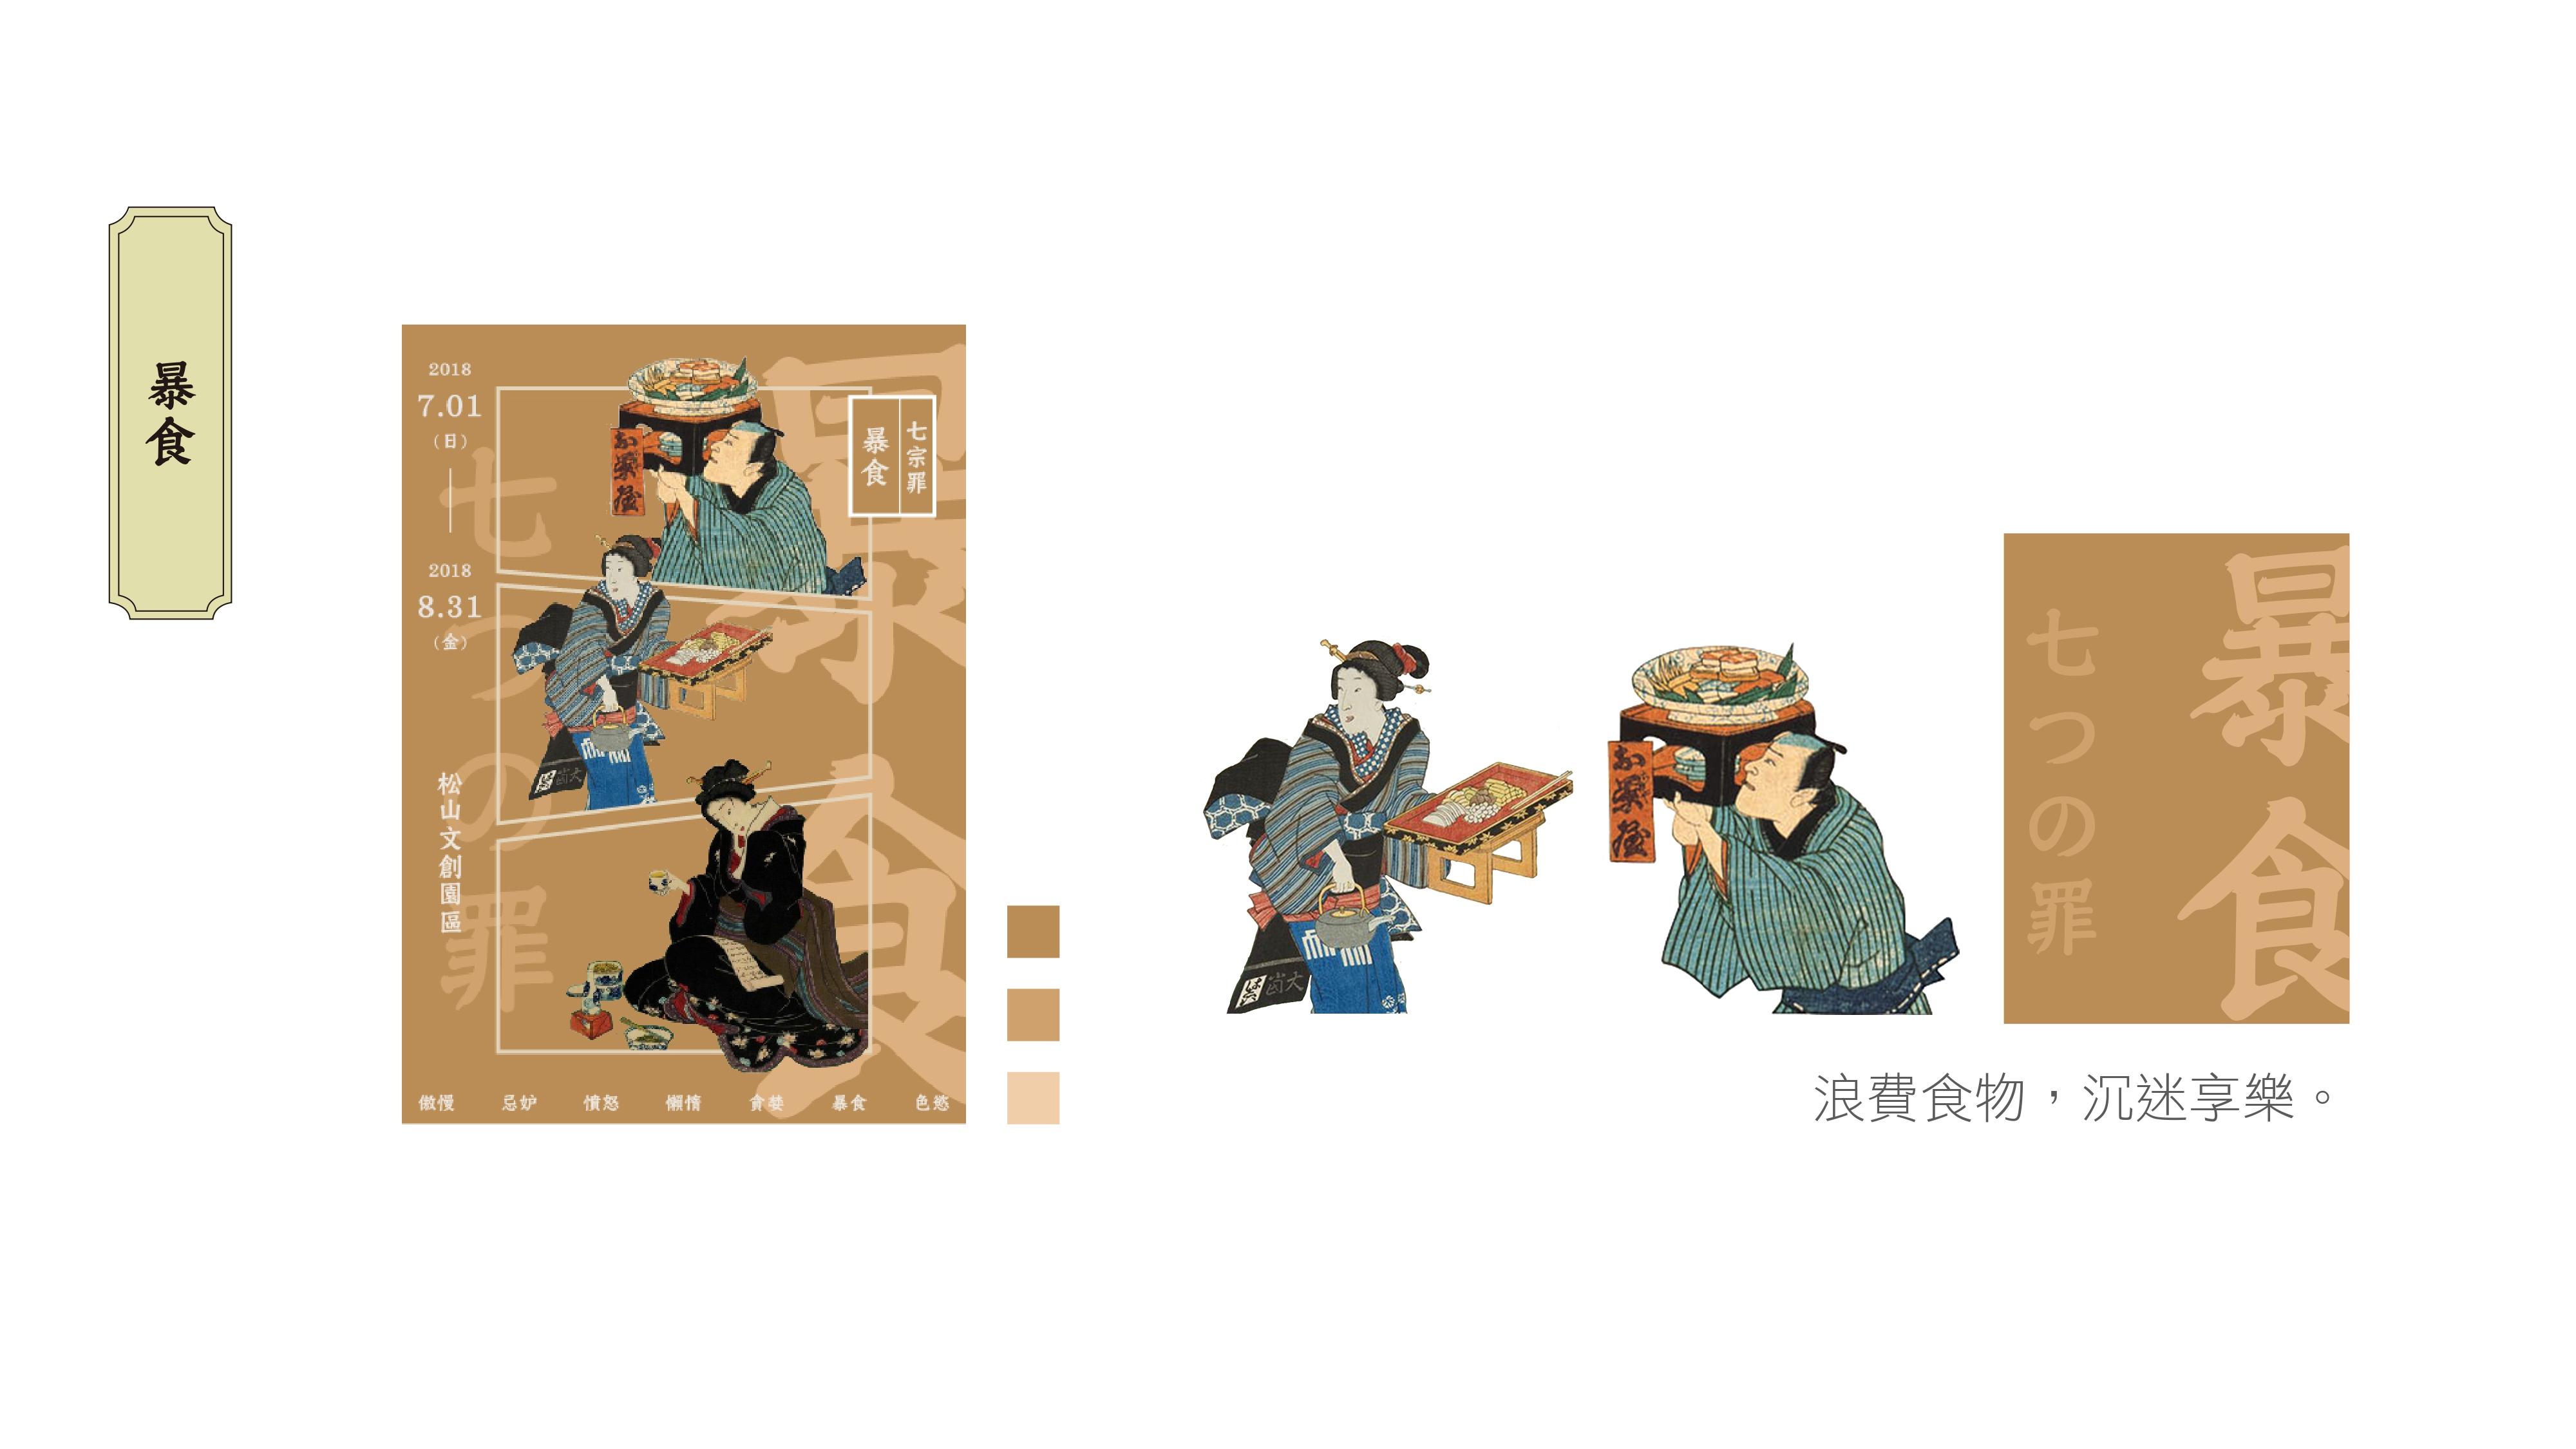 七宗罪_pages-to-jpg-0008